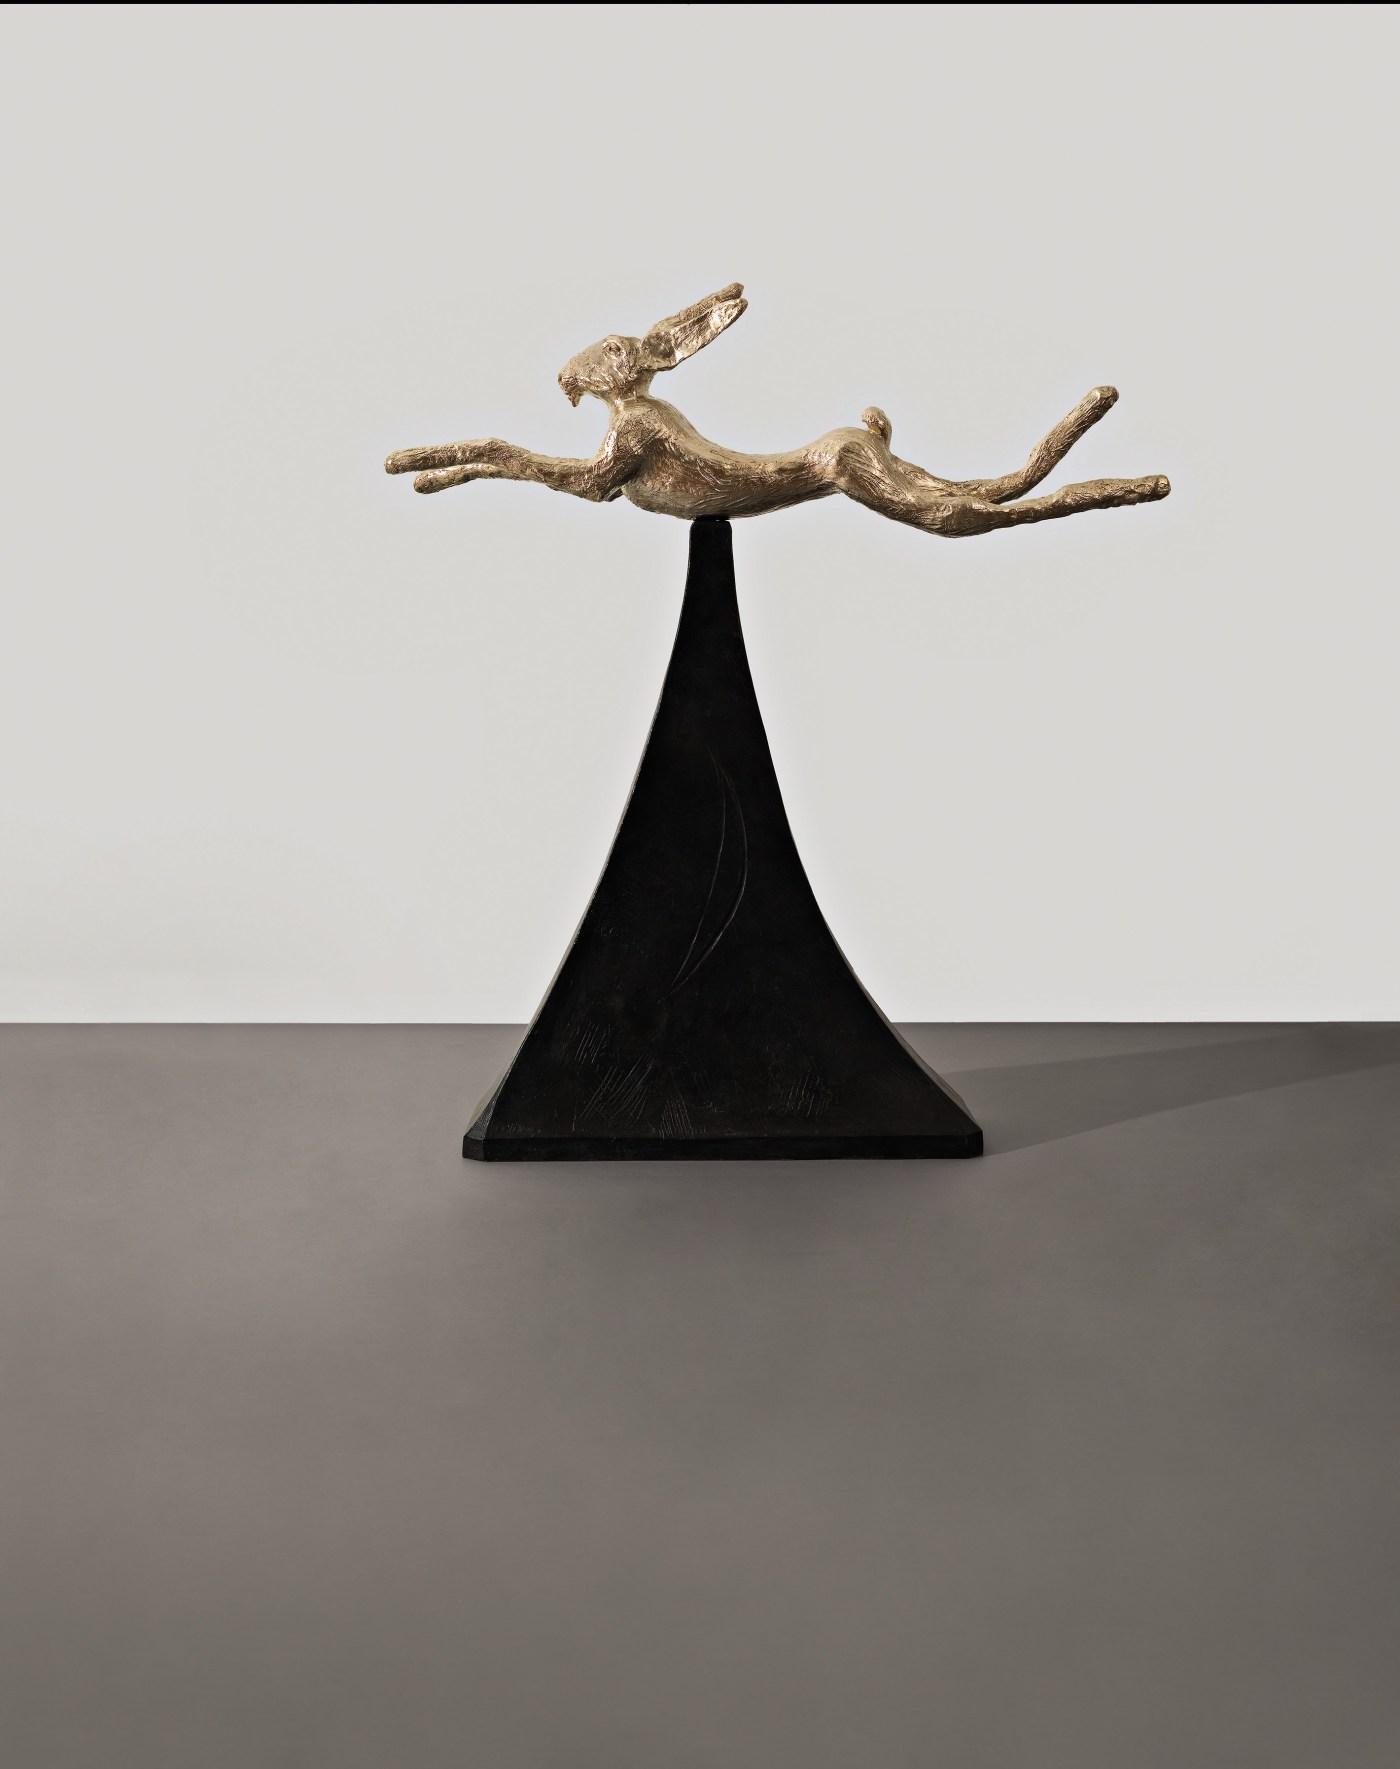 BARRY FLANAGAN, Moon Gold Hare, 2008